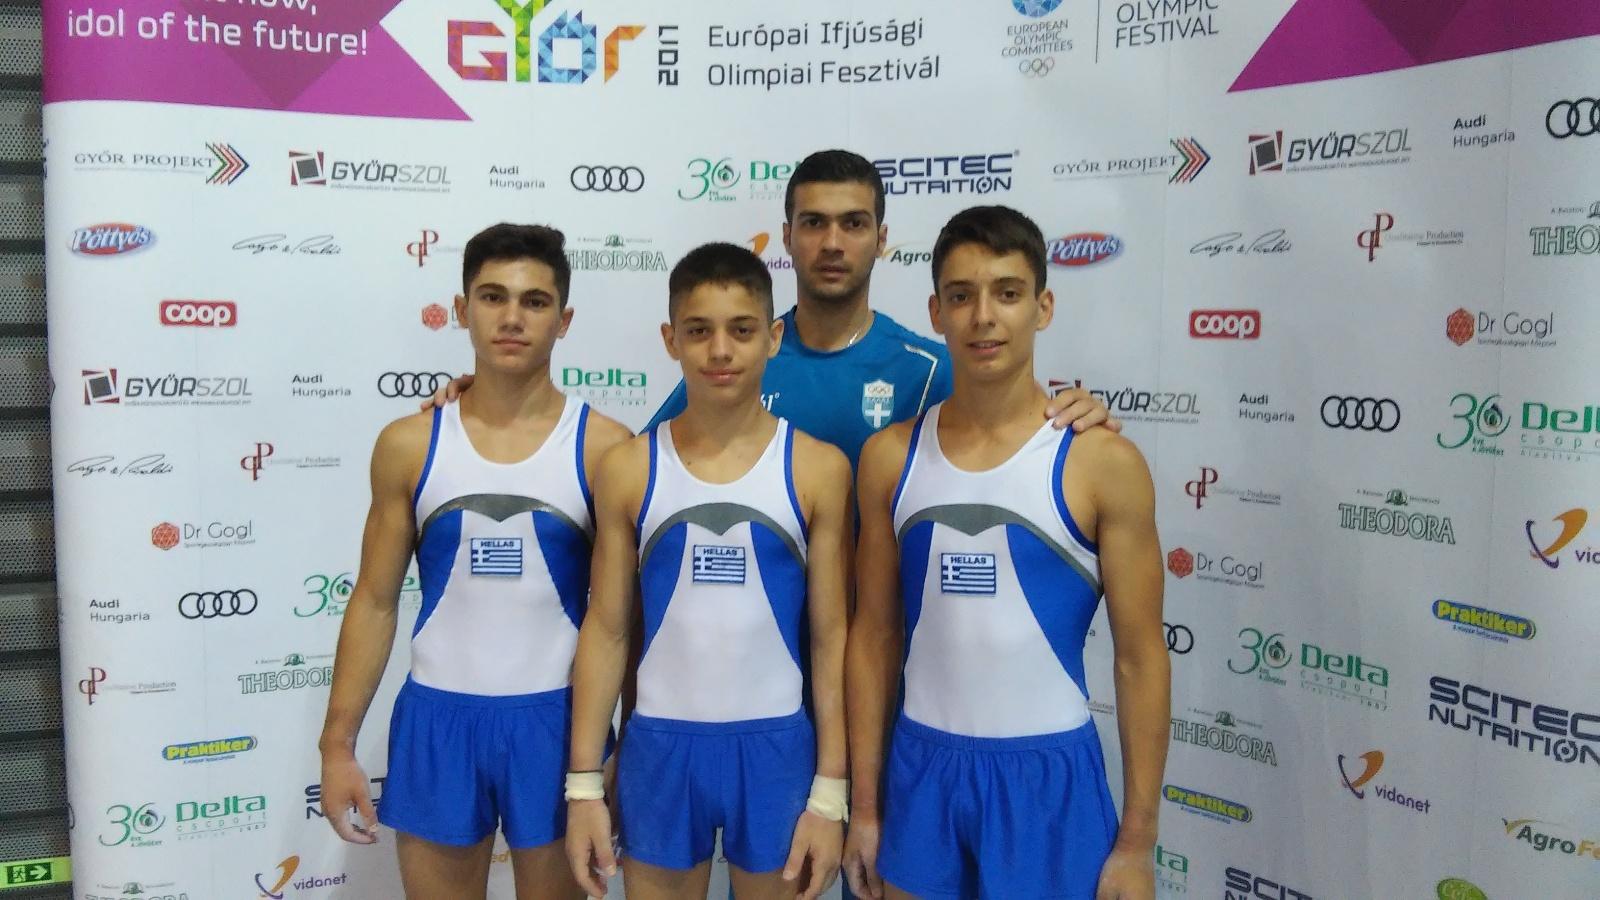 eyof2017-1-kanellos-tsolakidis-garivaldis-zahariadis